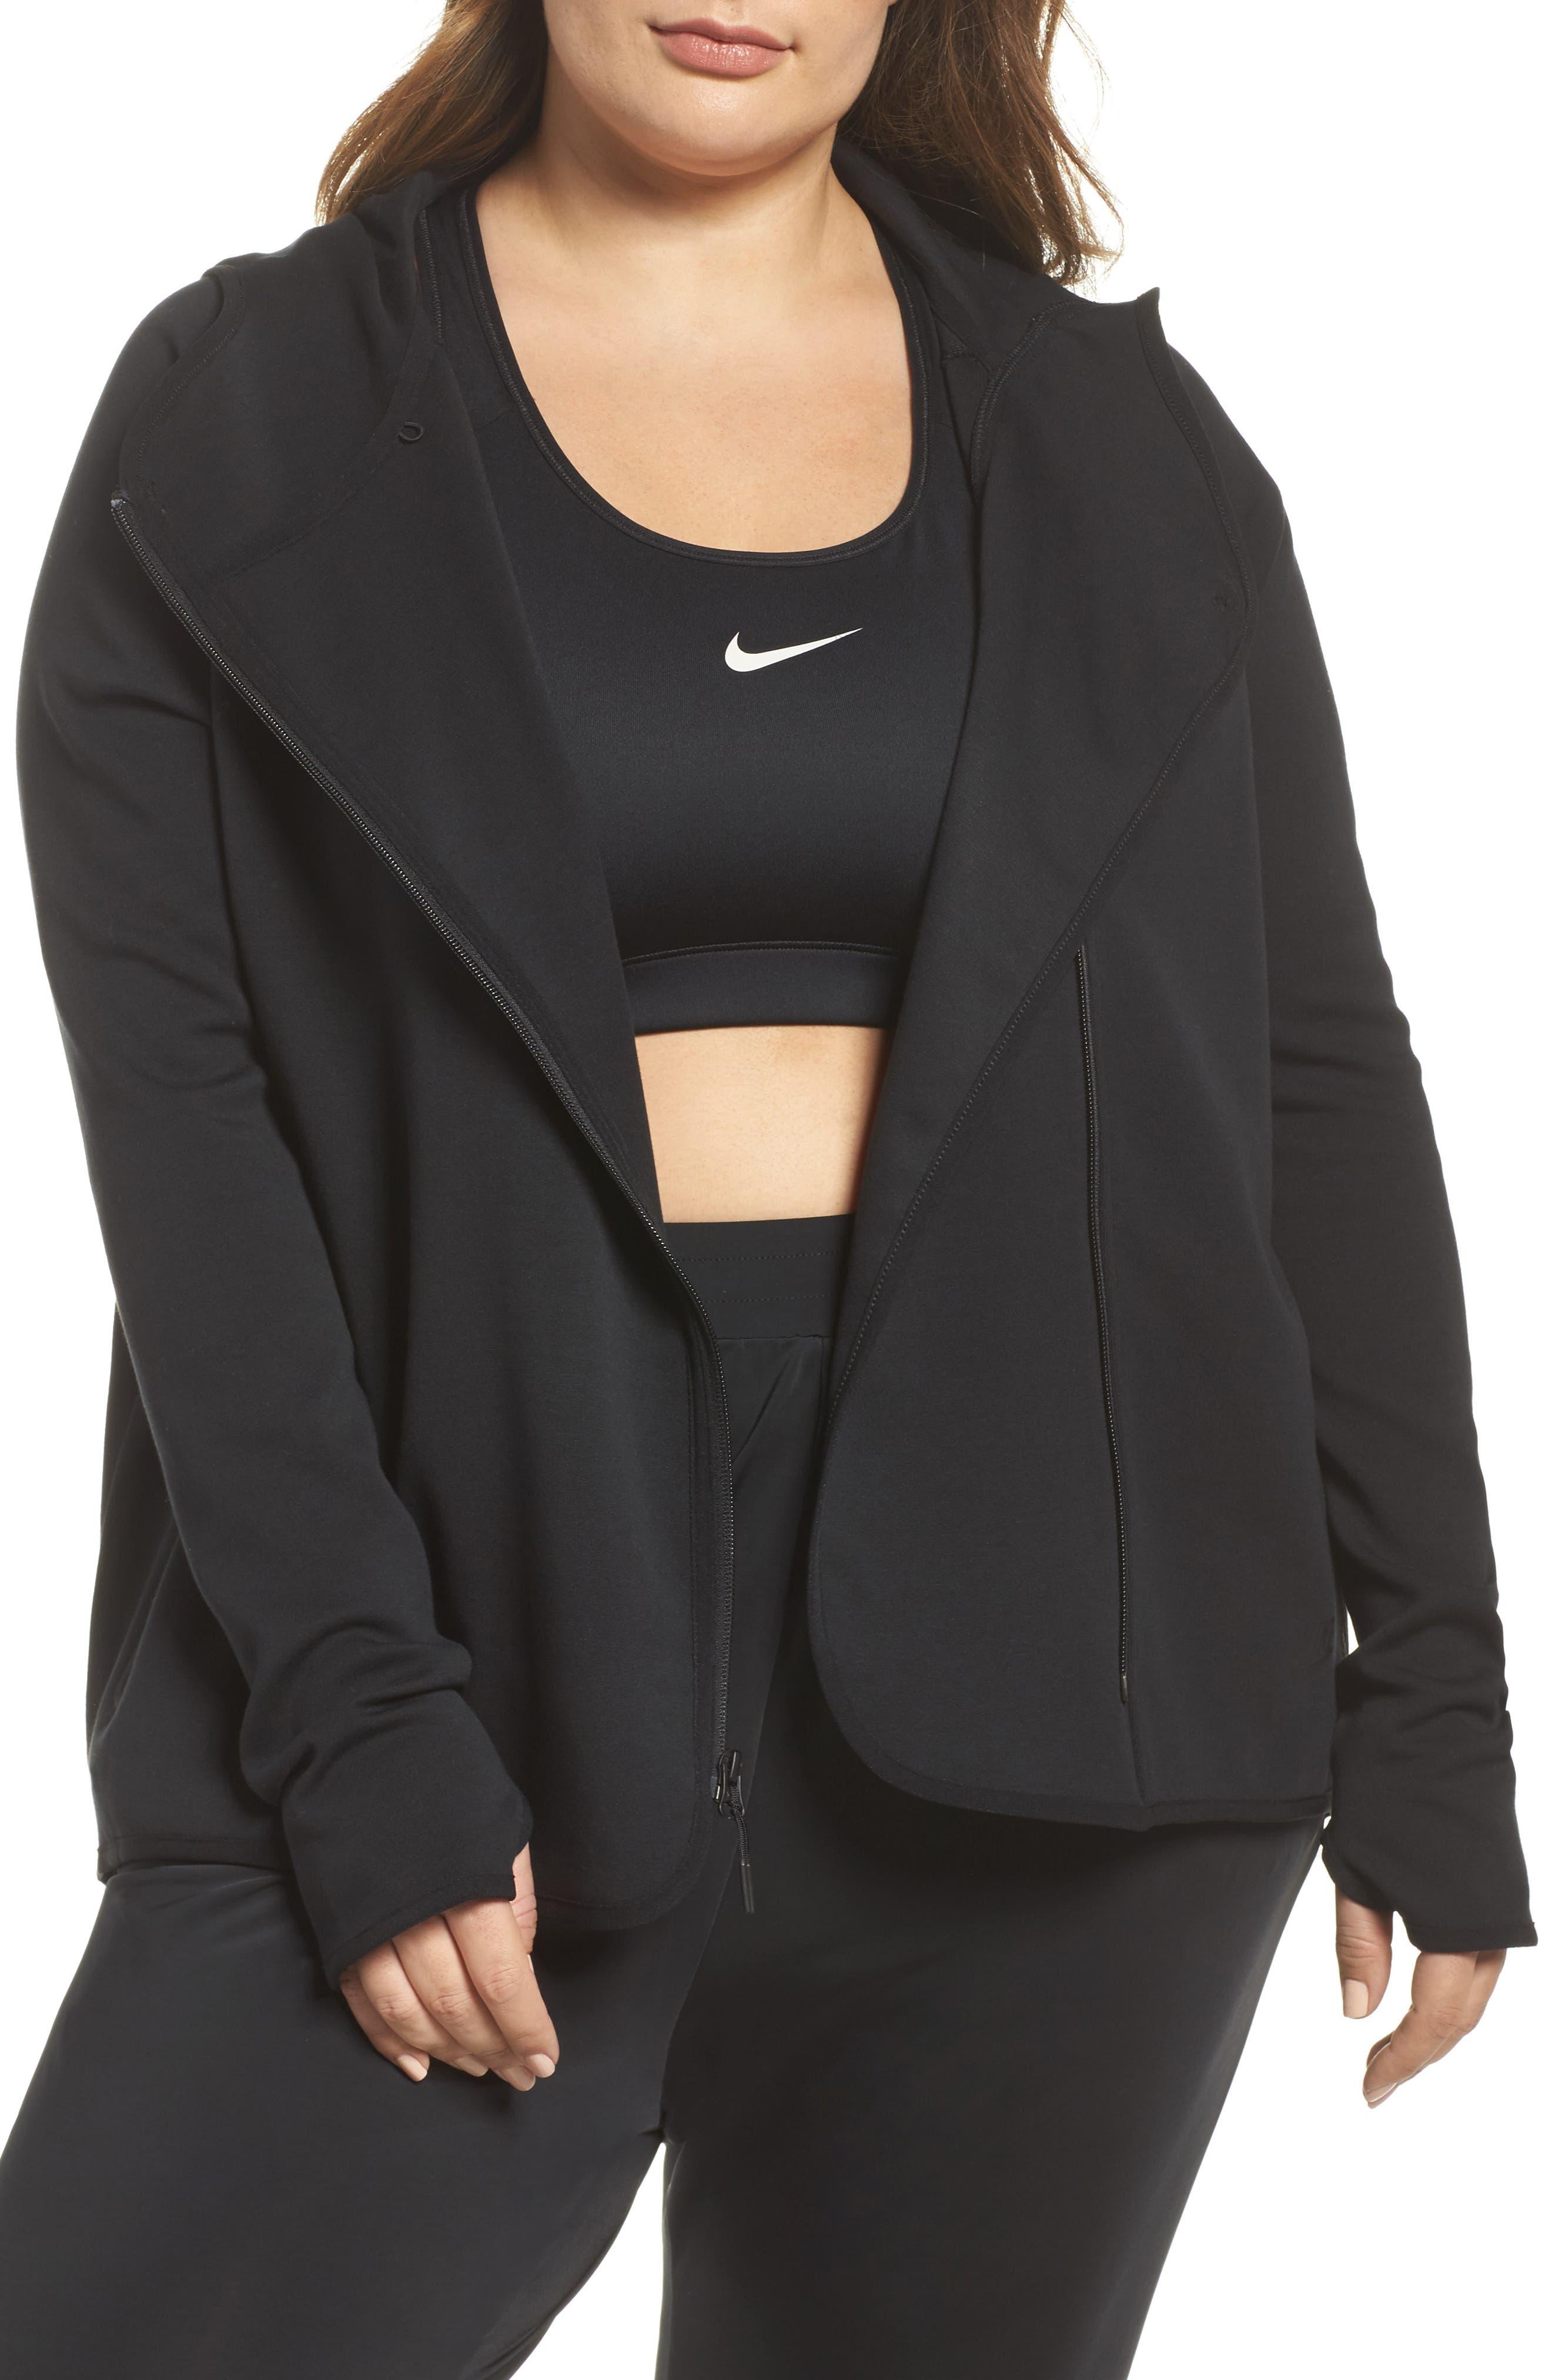 Sportswear Tech Fleece Zip Cape,                             Main thumbnail 1, color,                             Black/ Black